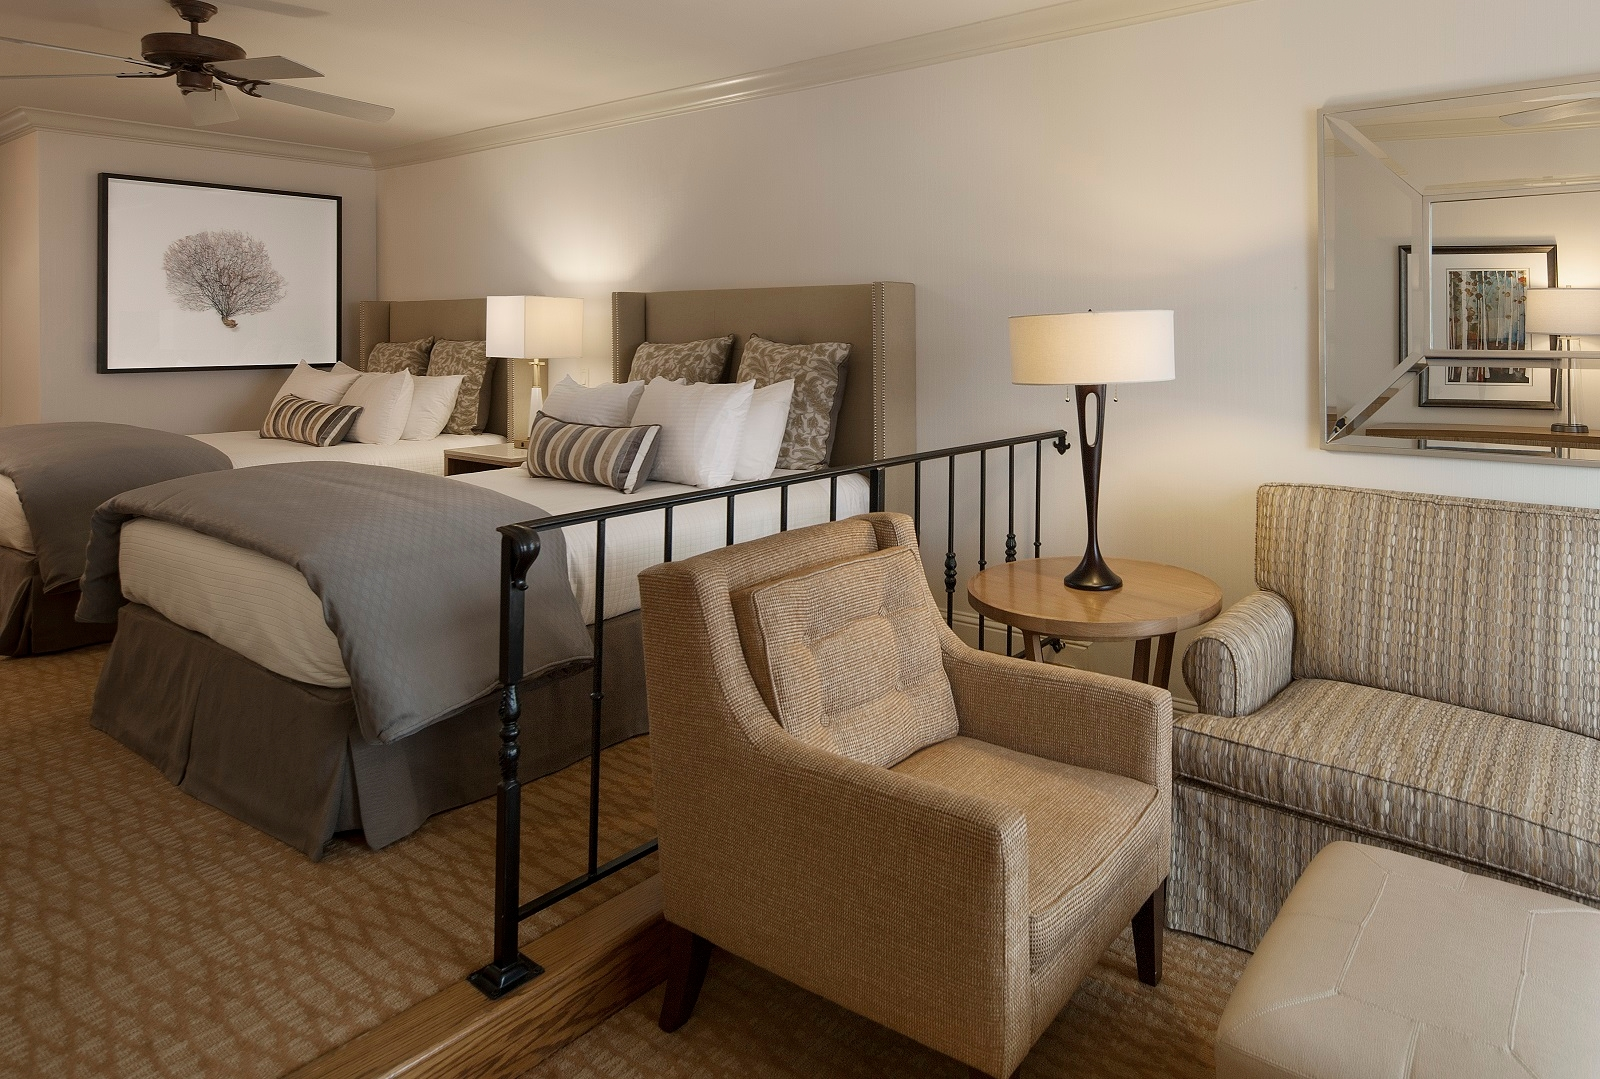 pelican inn suites in cambria ca 93428. Black Bedroom Furniture Sets. Home Design Ideas